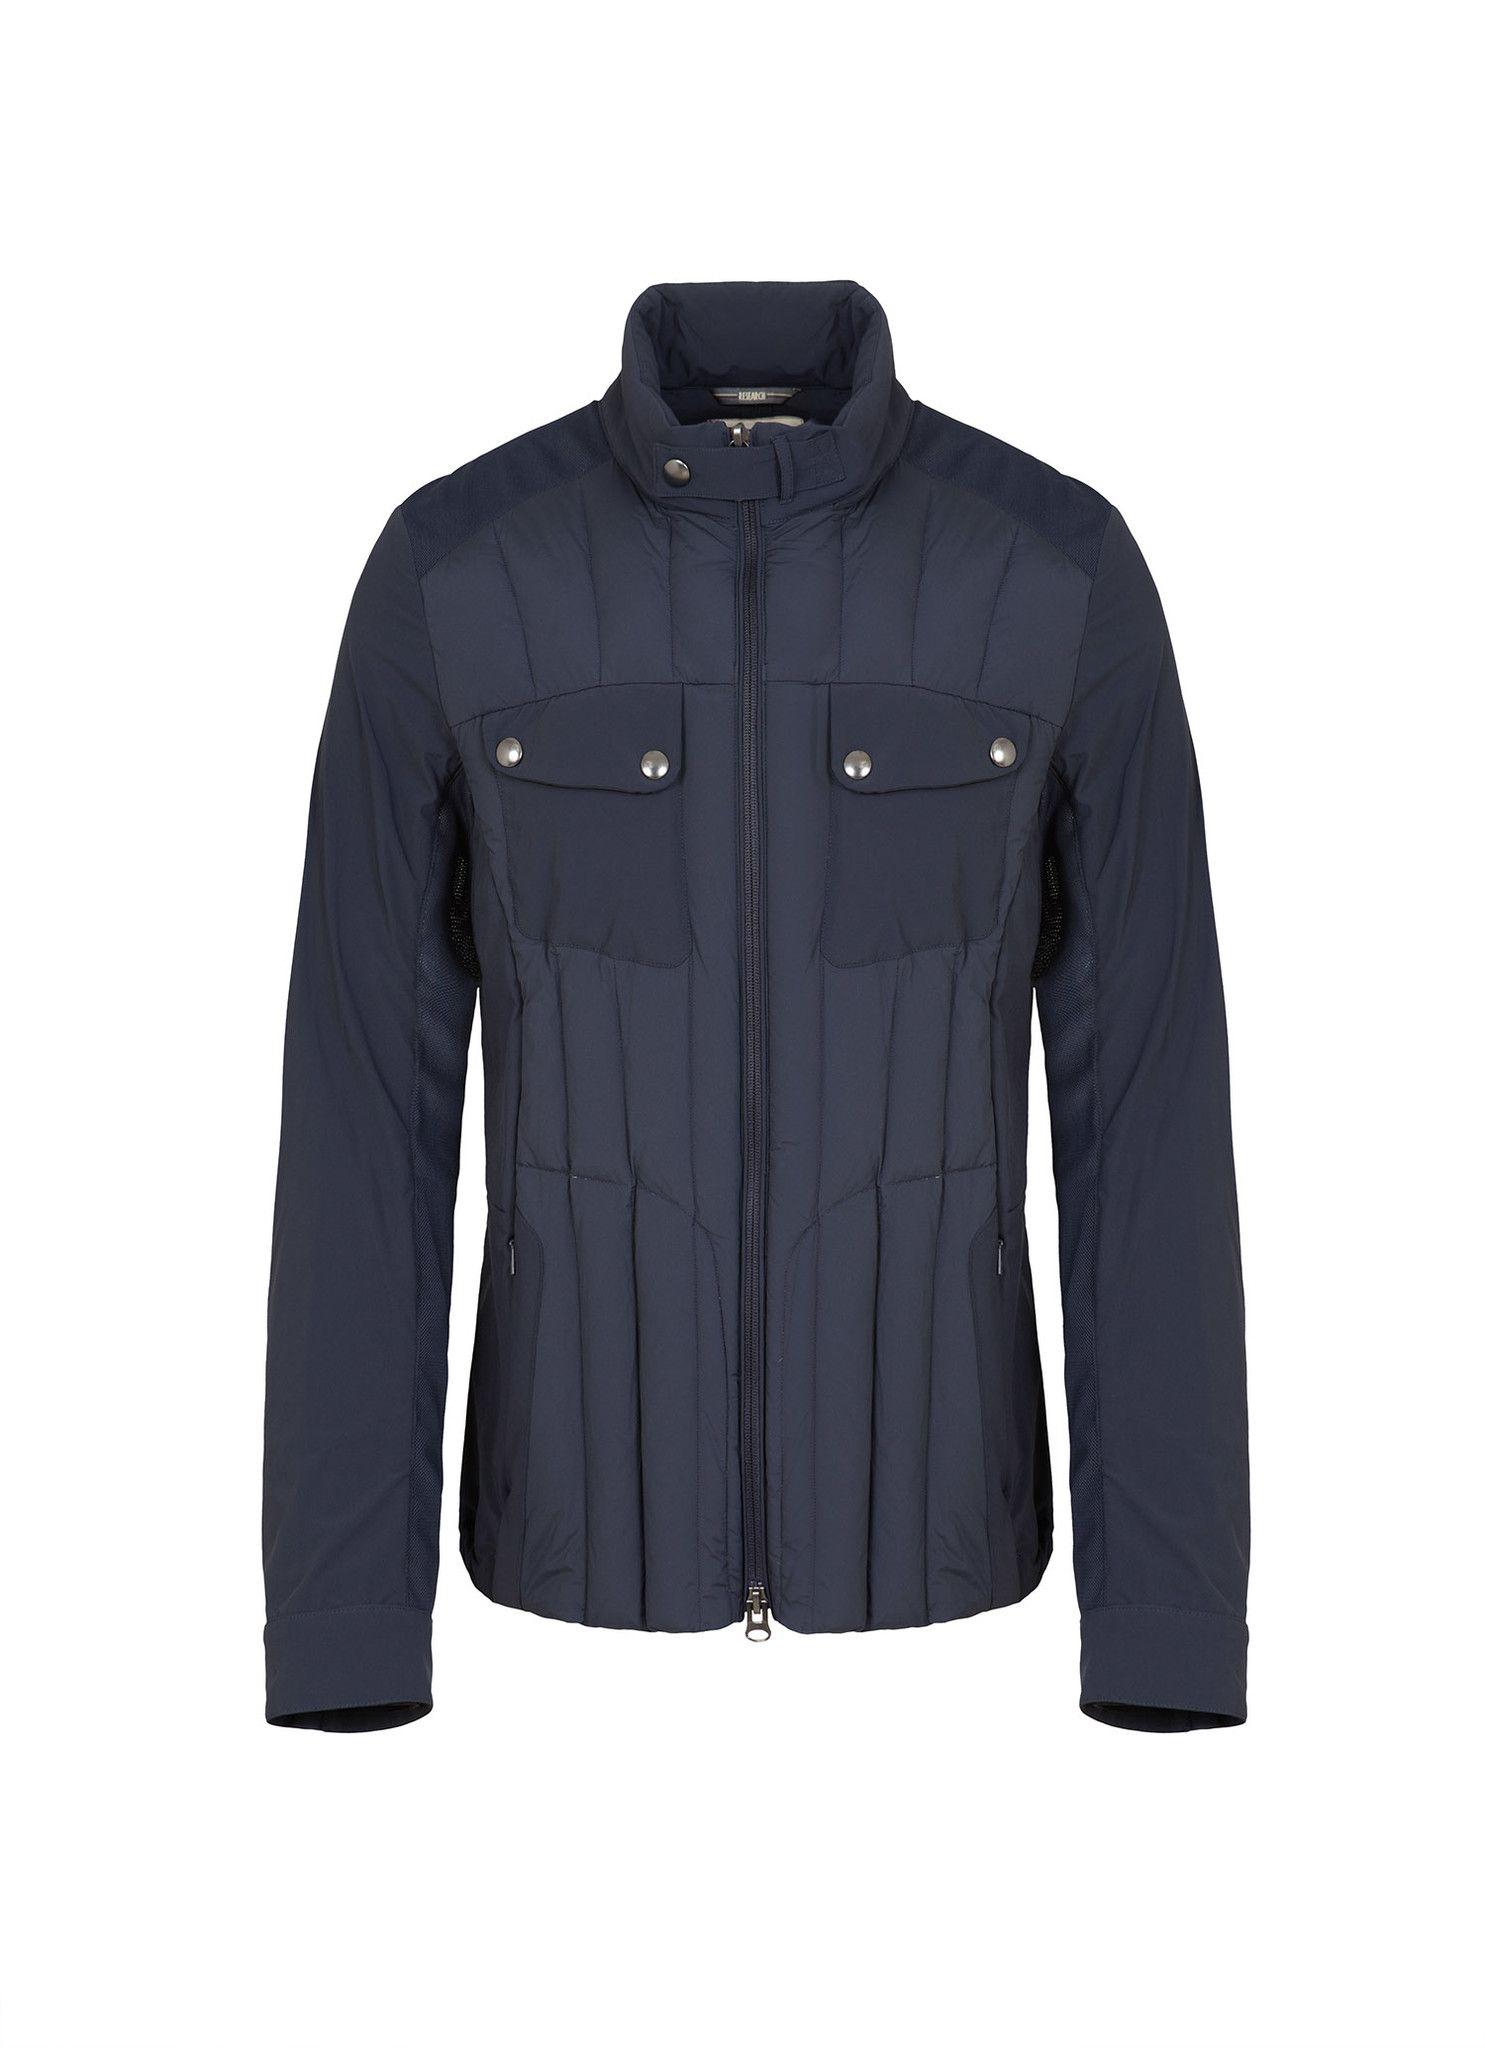 quality design 84497 6ada6 -50% FIELD JACKET COLMAR UOMO STRETCH LINEA RESEARCH S17 MU1267 BLU |  Outlet Firme Uomo Abbigliamento | Shop Online: Boutique Irene & Mario